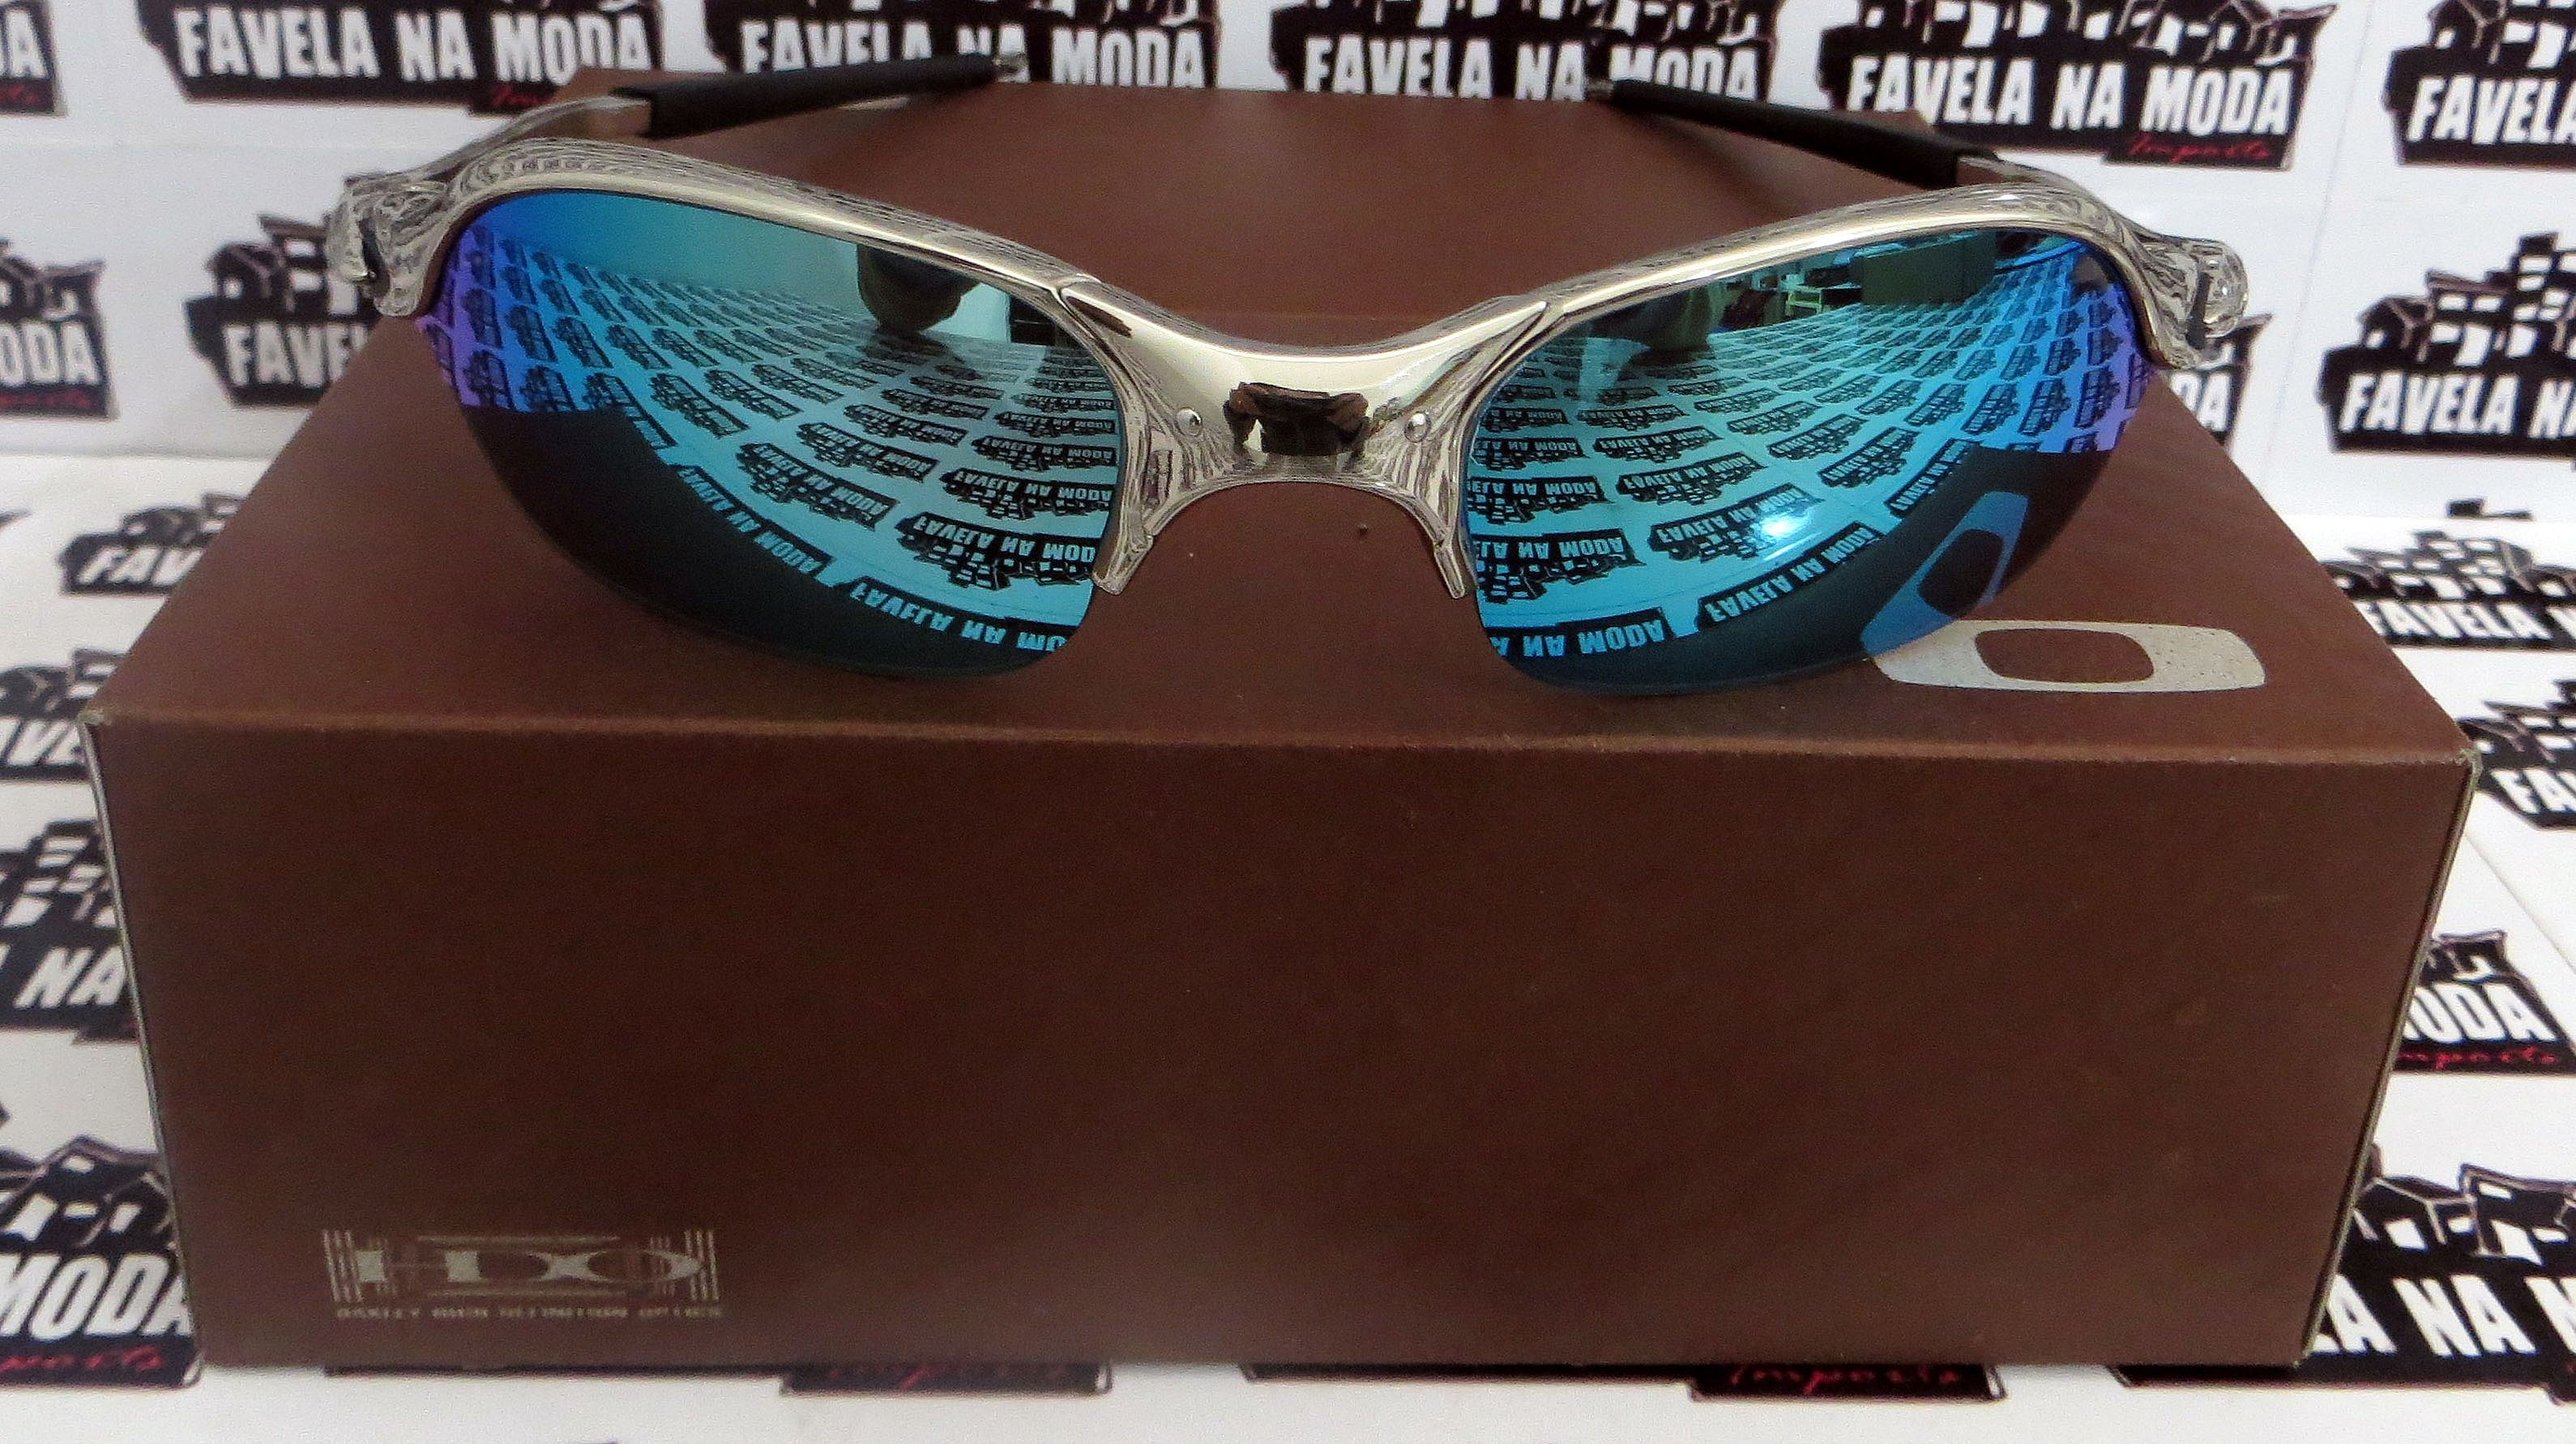 fe50ff6580f47 Óculos Oakley Romeo 2 - Polished   Ice Thug   Borrachas Pretas